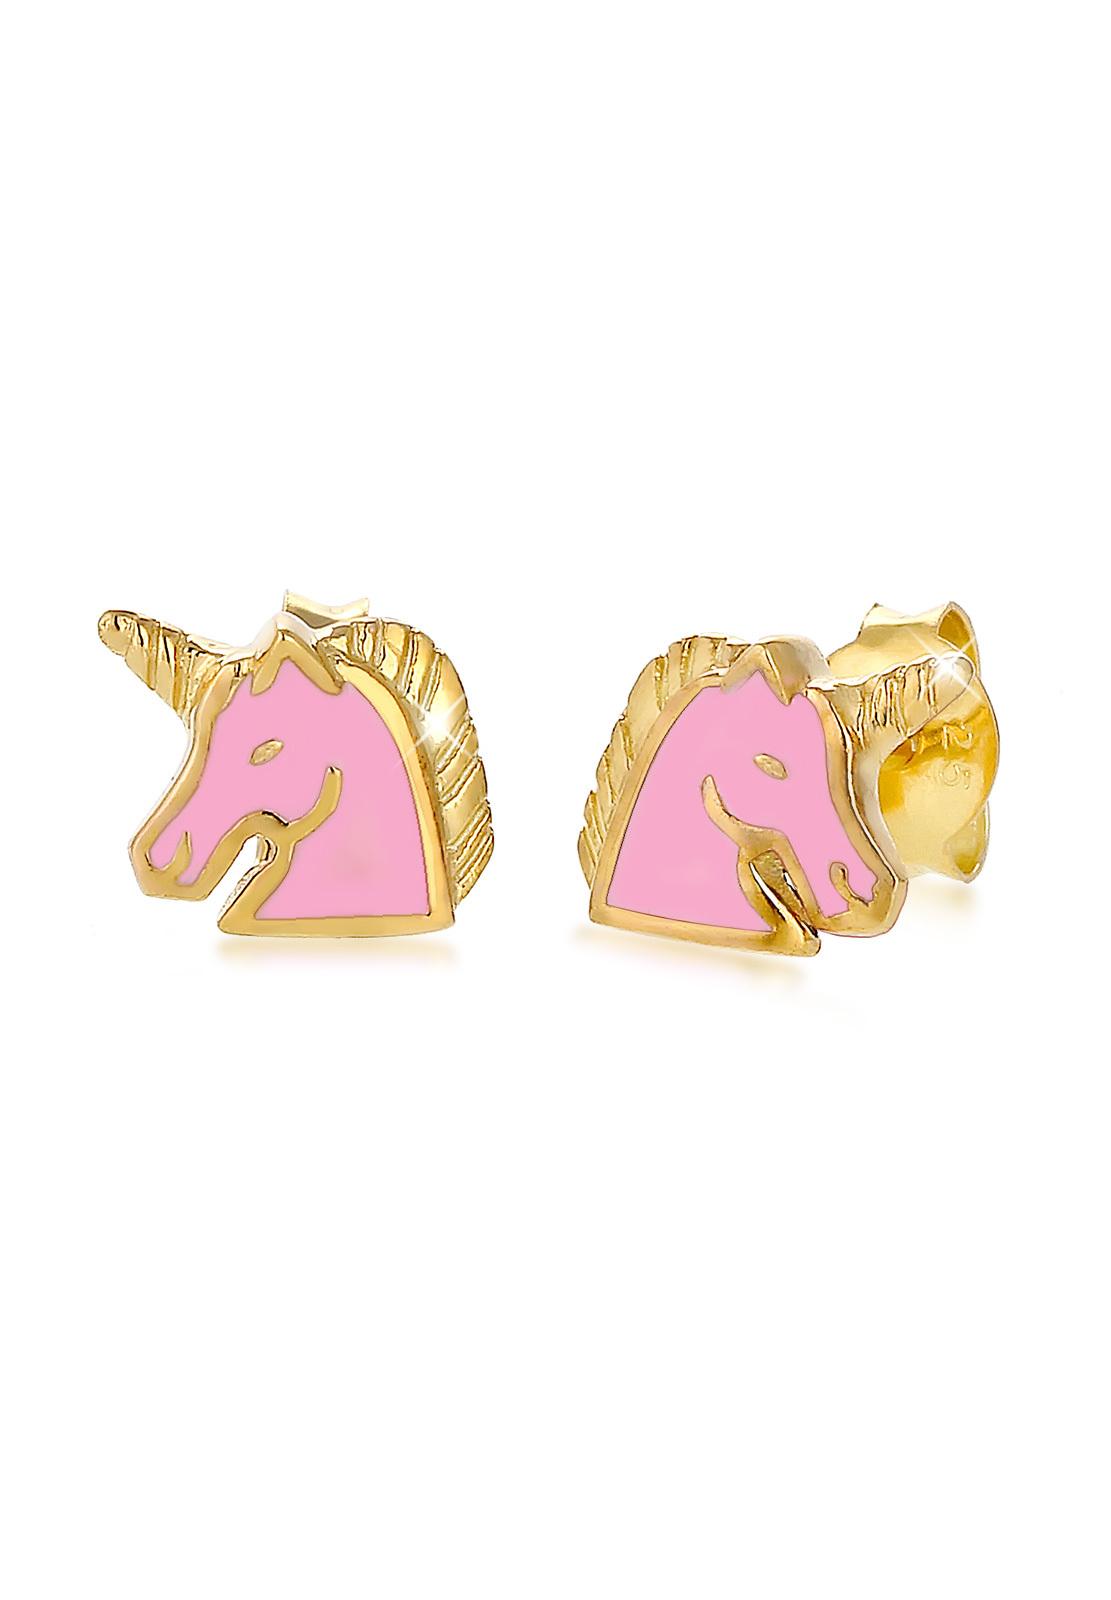 Ohrring Einhorn | 925 Sterling Silber vergoldet